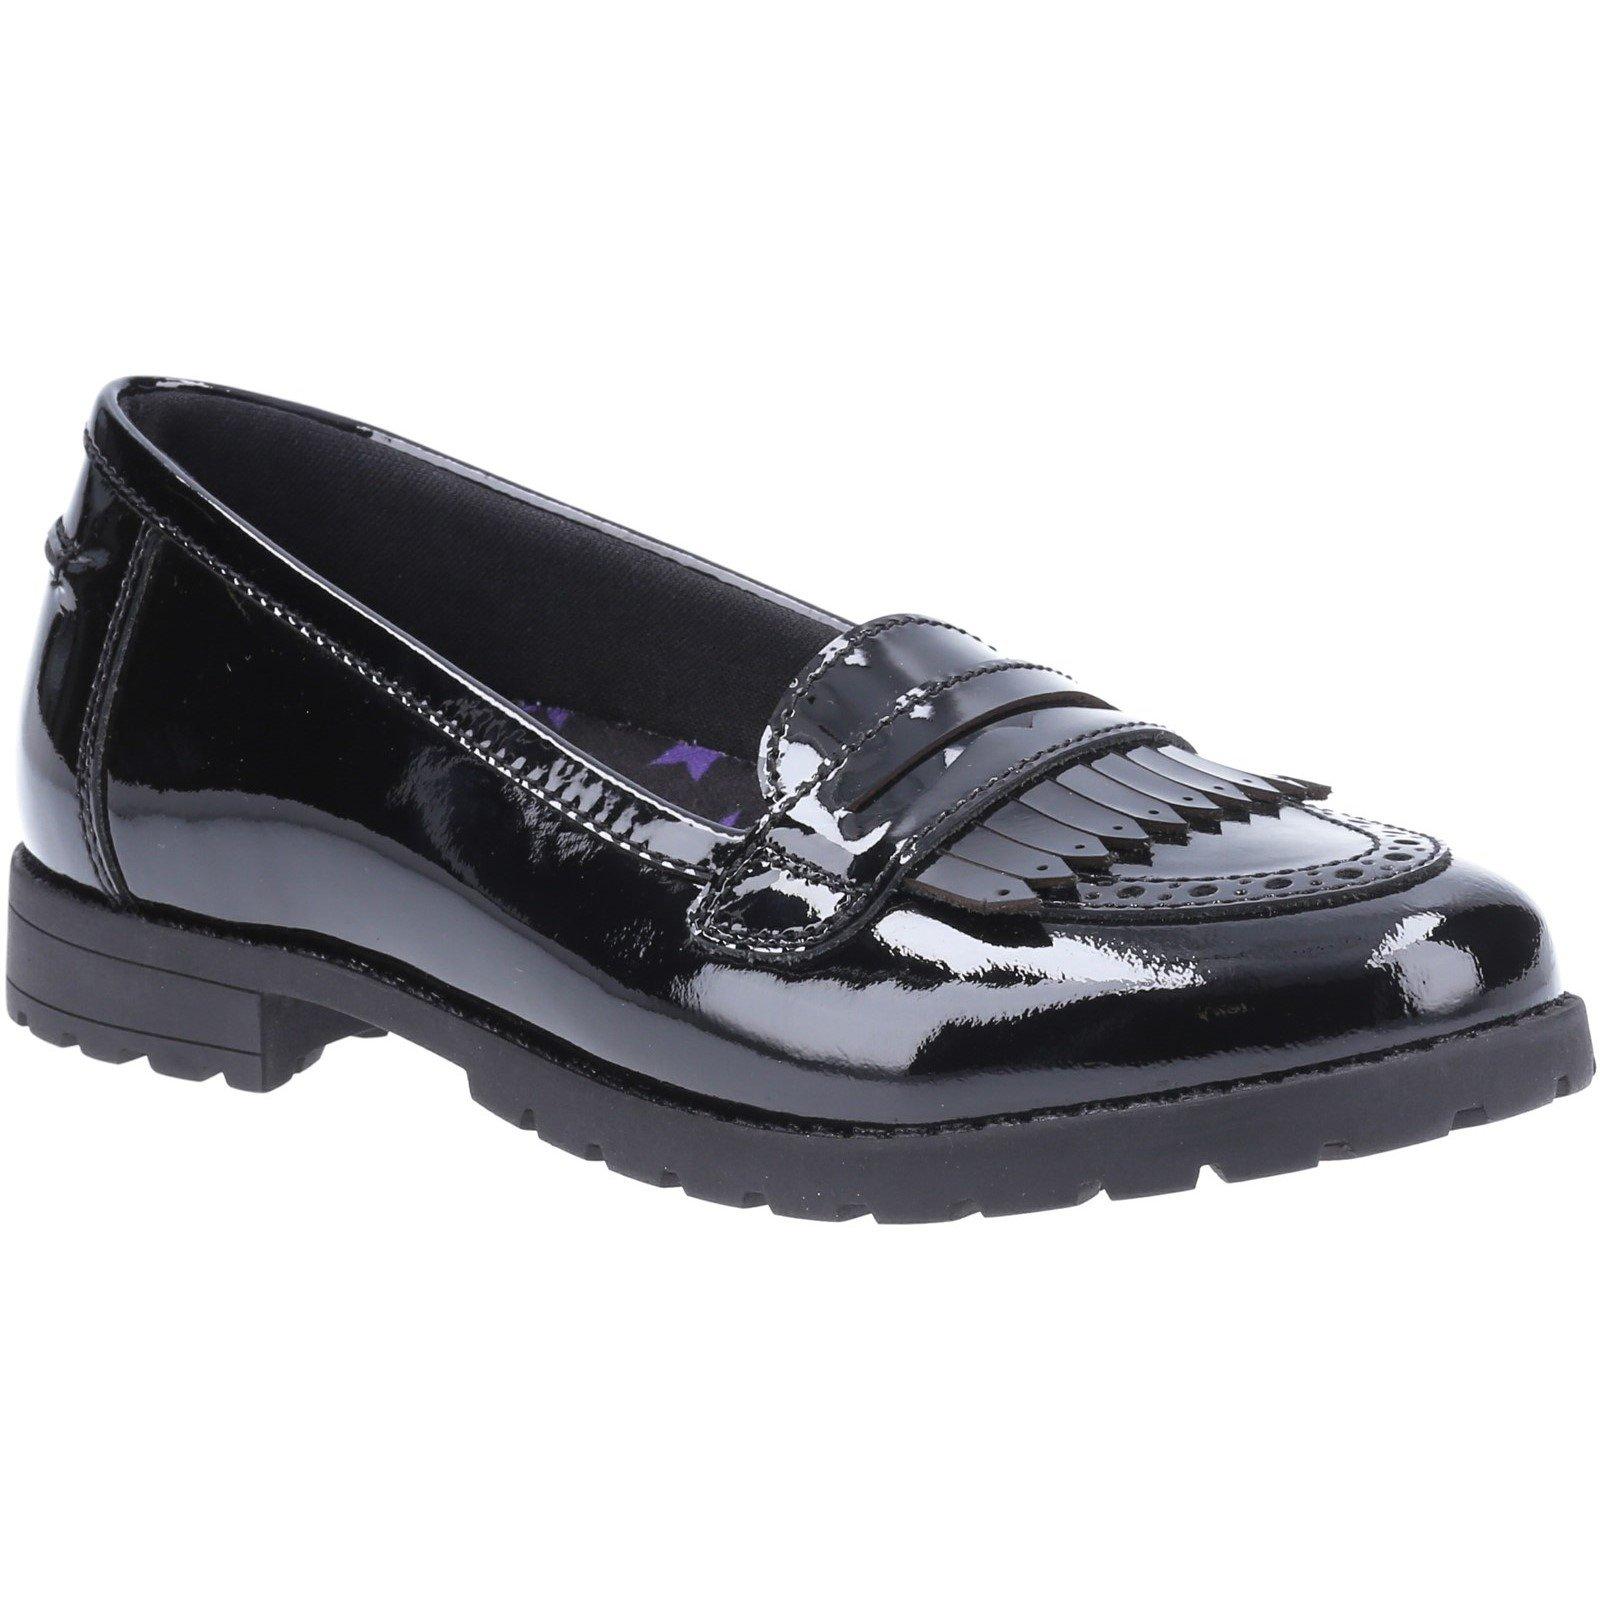 Hush Puppies Kid's Emer Senior School Shoe Patent Black 32596 - Patent Black 3